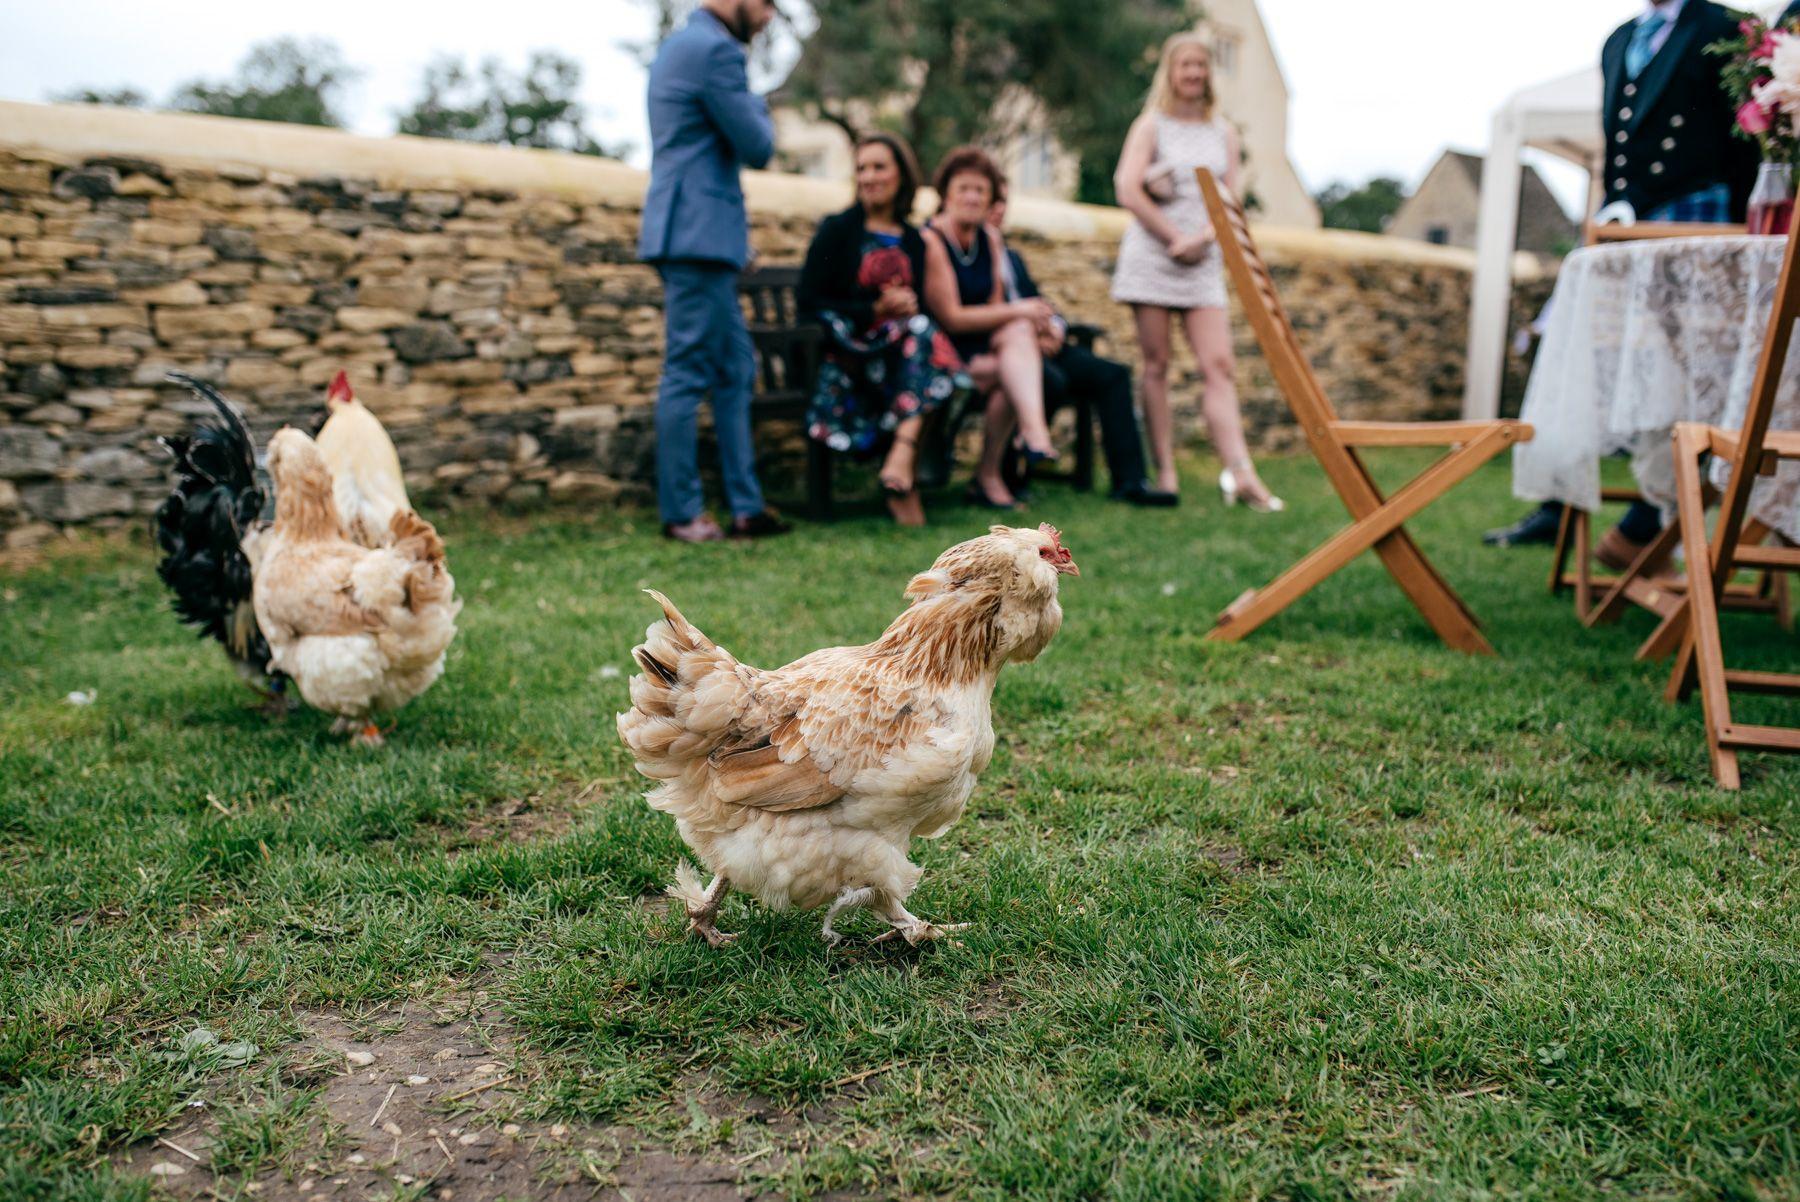 Creative wedding at Cogges Manor Farm Wedding venue from alternative wedding…